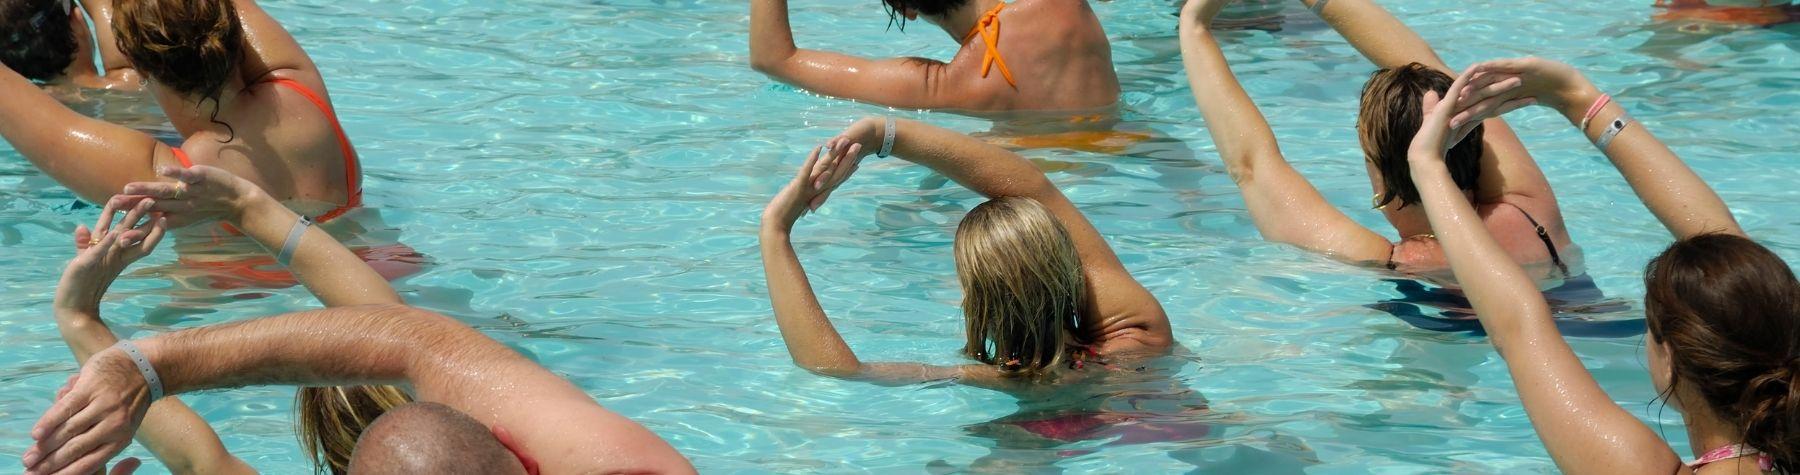 All aboard for Aquafit –popular water-based fitness program extended